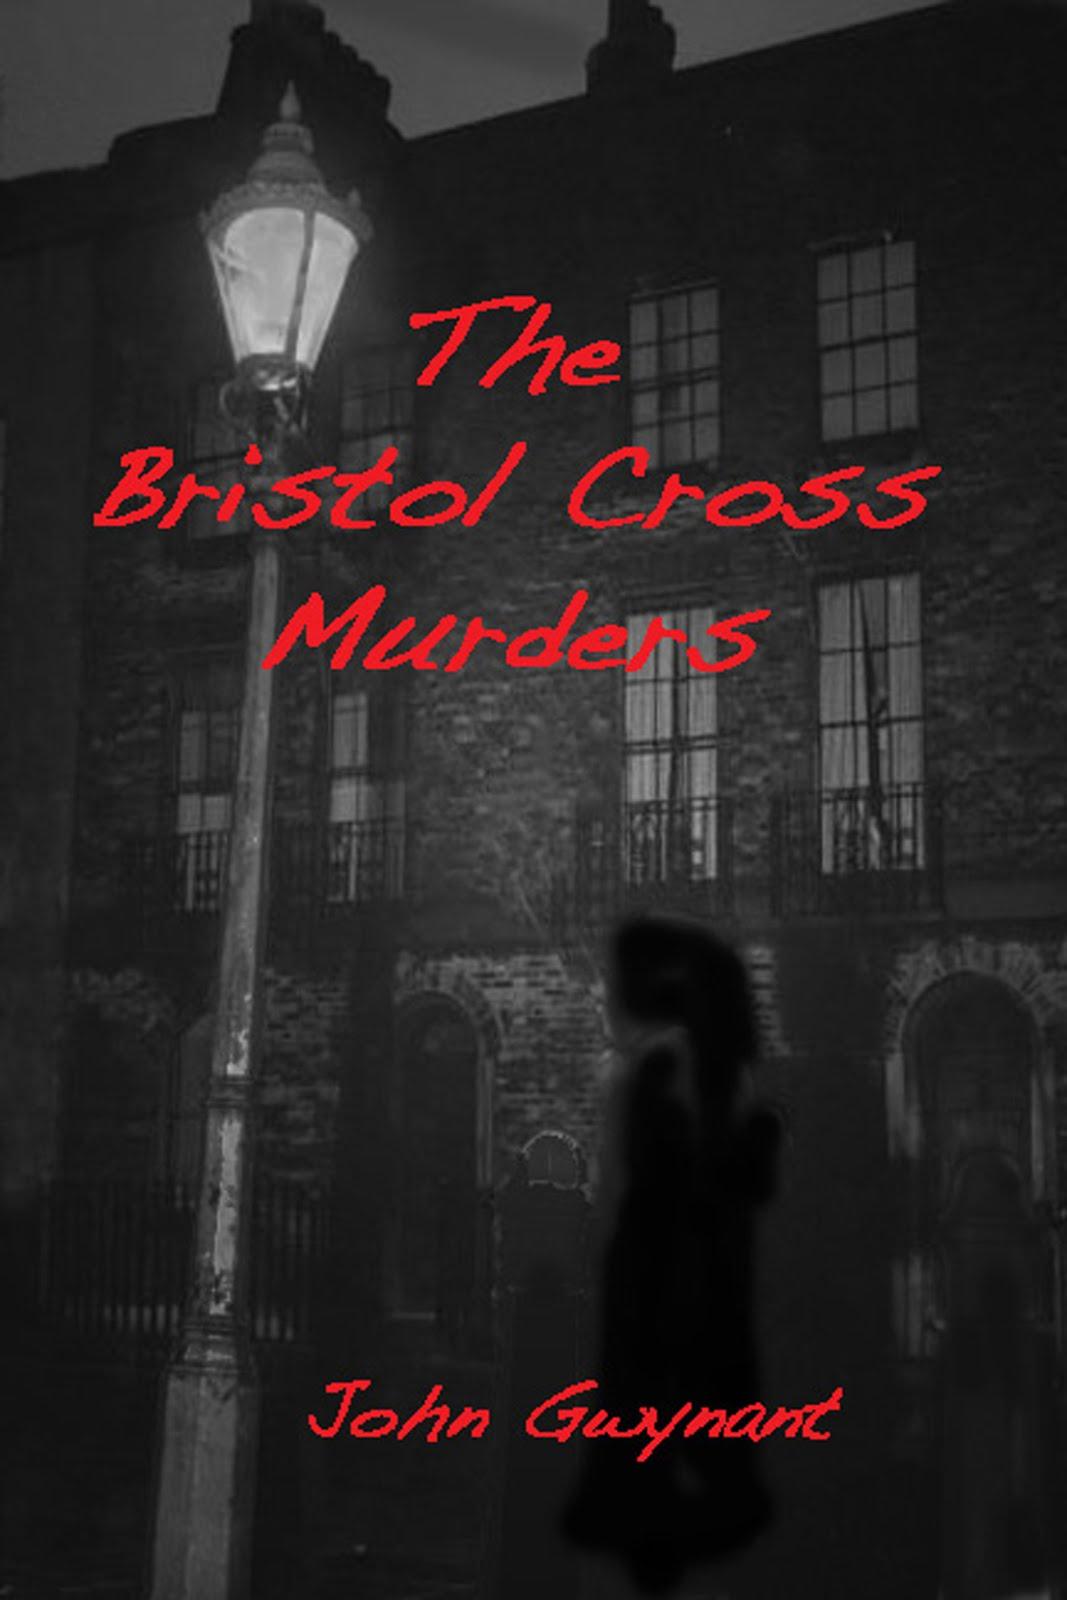 The Bristol Cross Murders